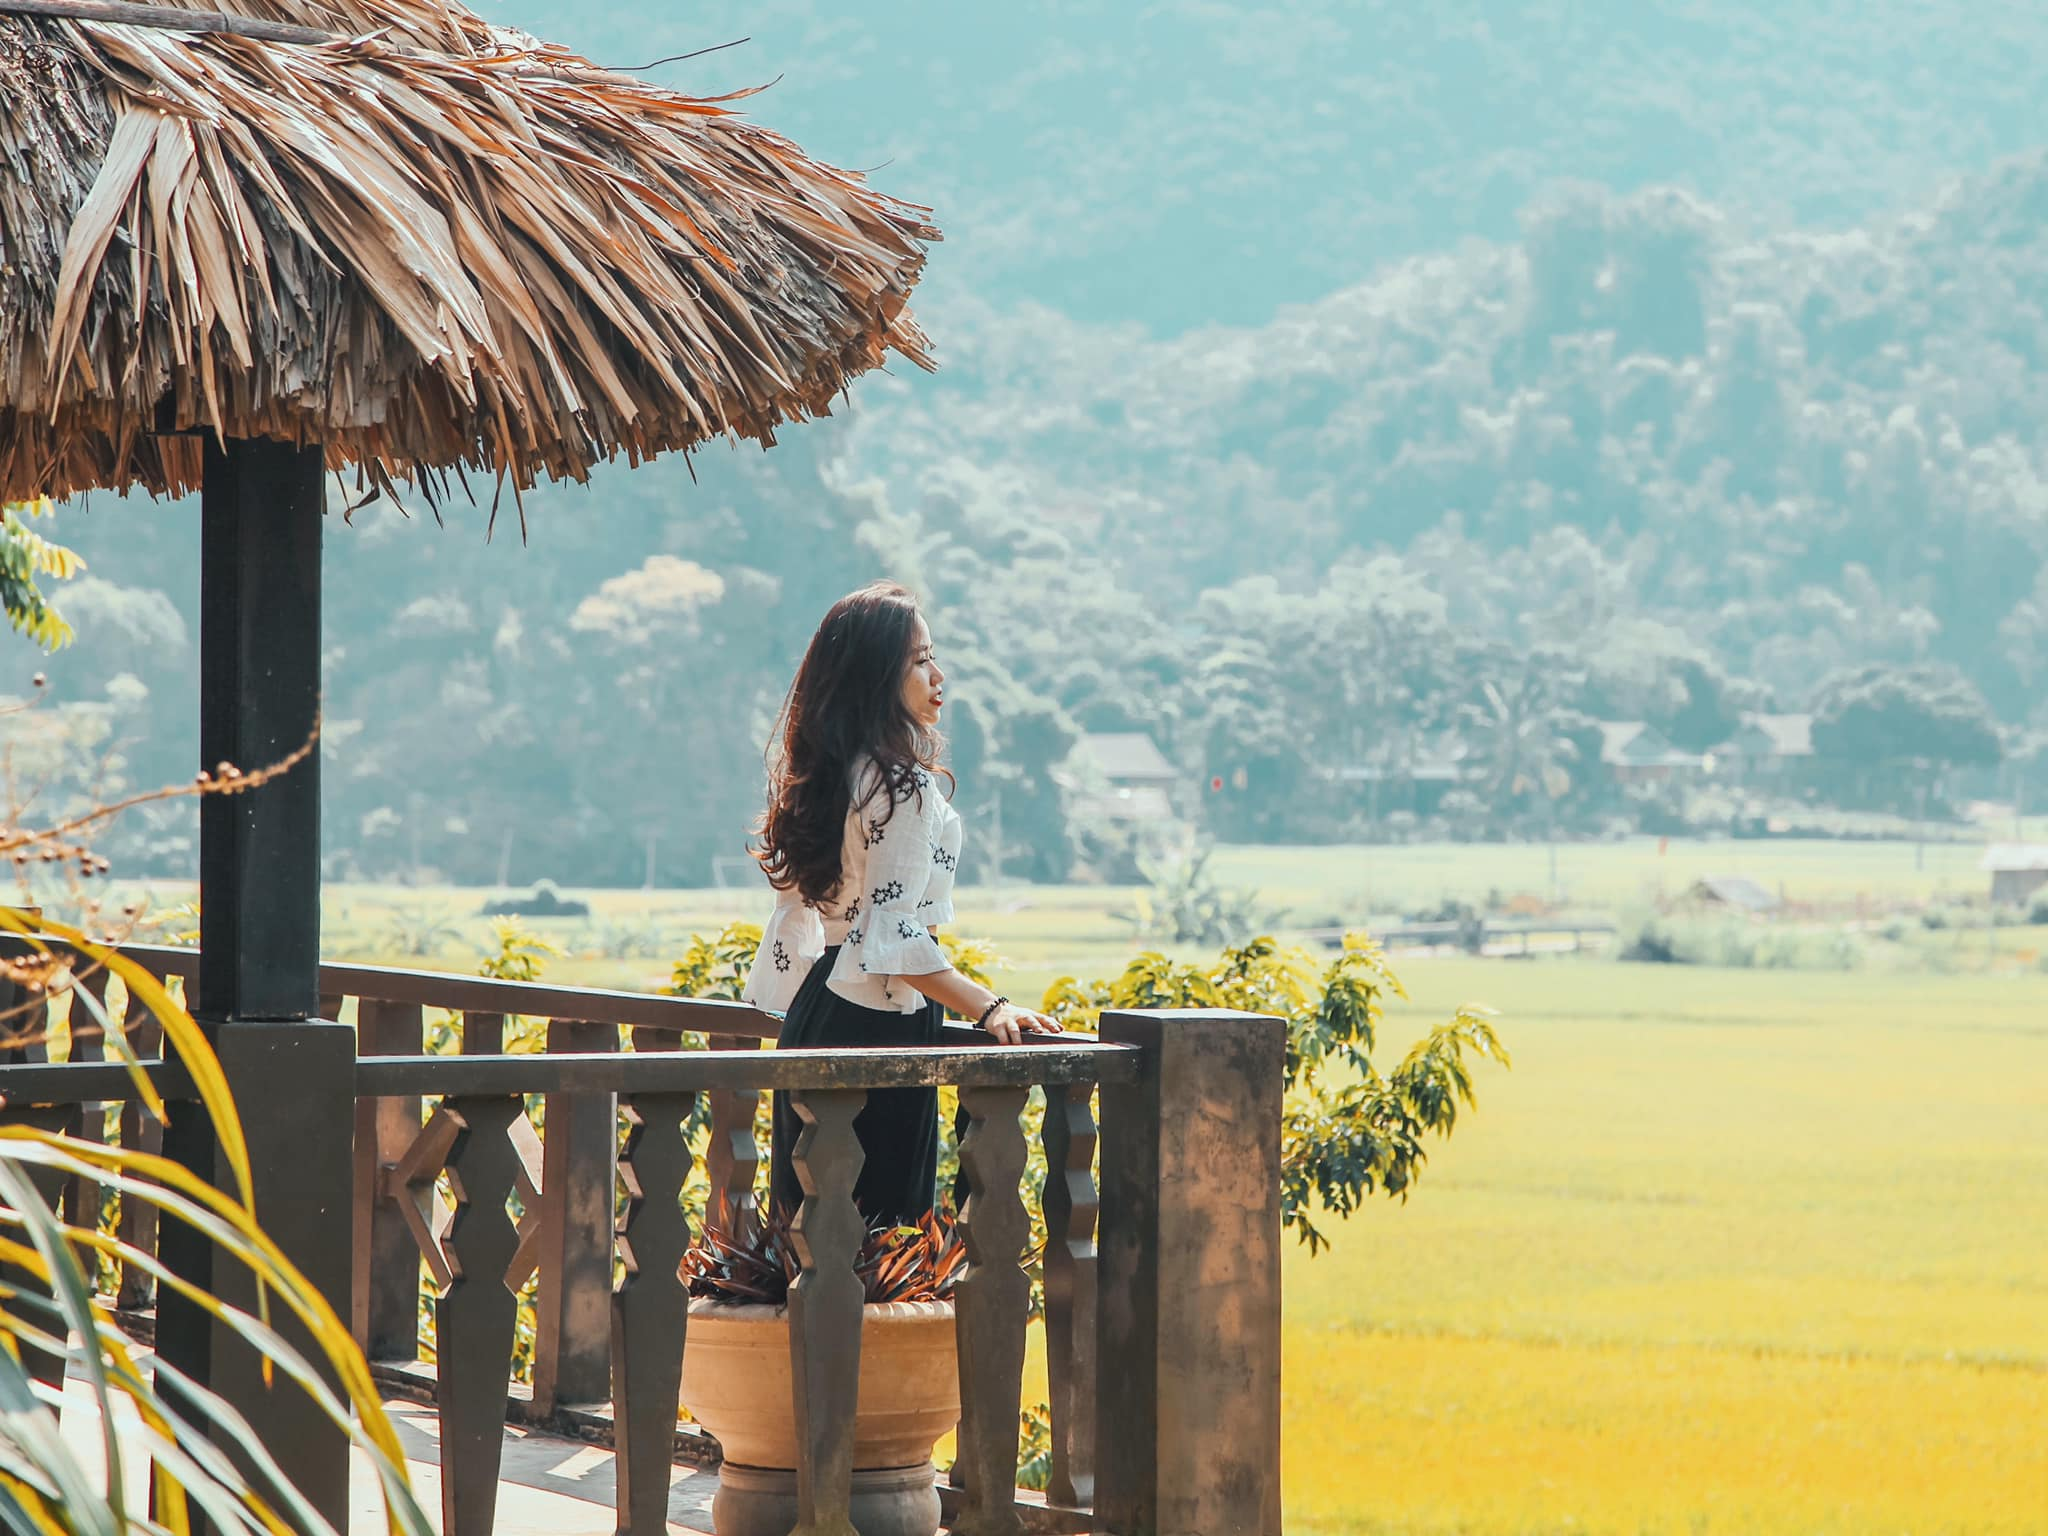 Tong-hop-nhung-dia-diem-du-lich-nui-hot-nhat-trong-dip-30-thang-4-vietmountain-travel13